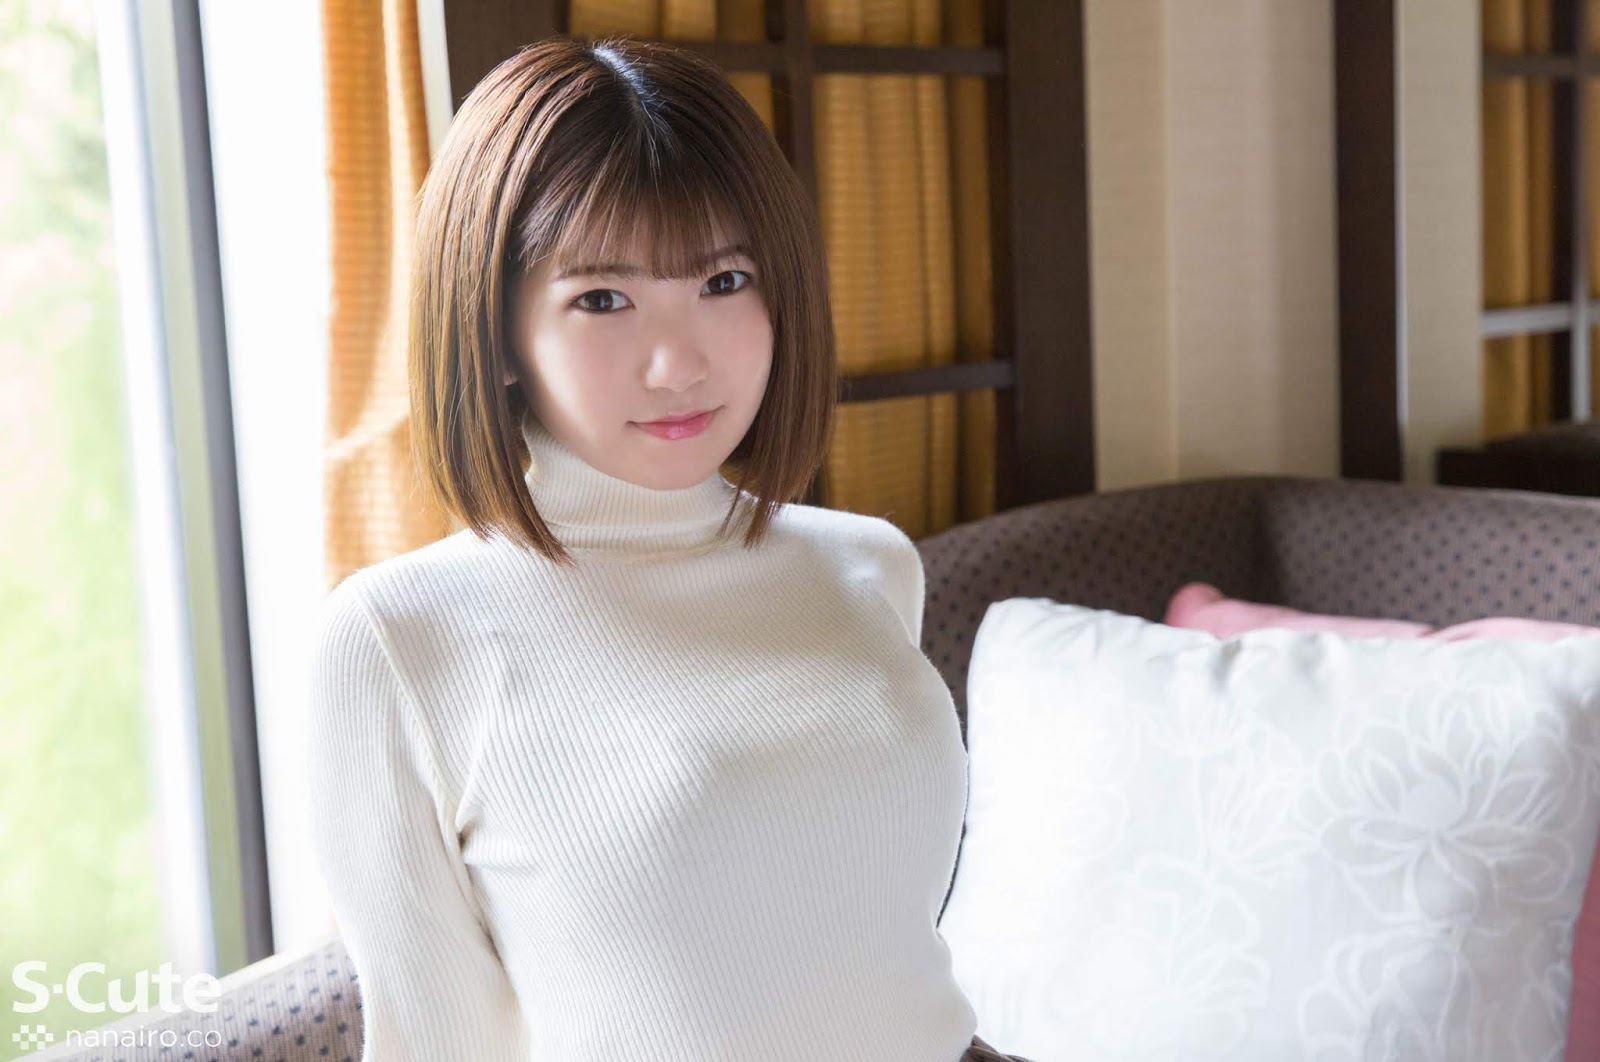 S-Cute 761_rina_02 本能のまま絡み合うセックス/RinaReal Street Angels